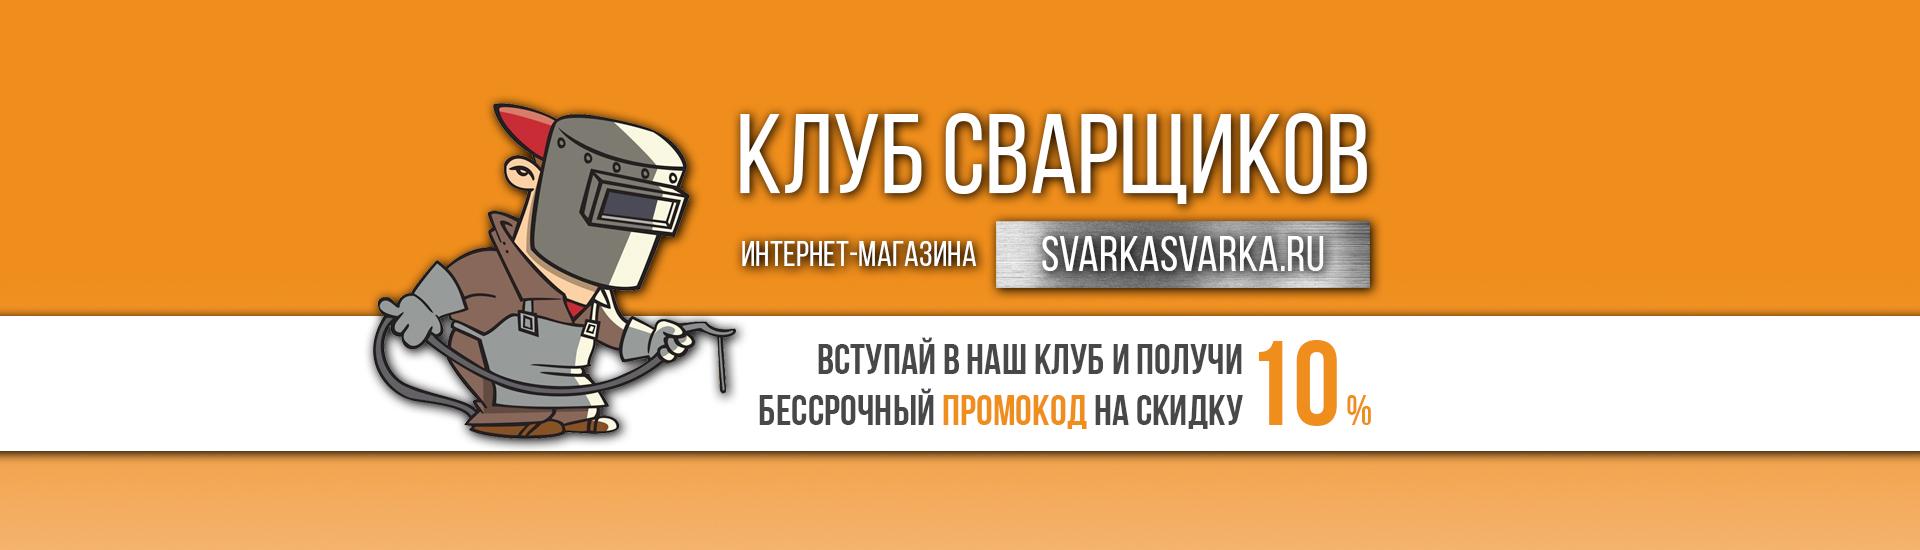 Клуб сварщиков svarkasvarka.ru